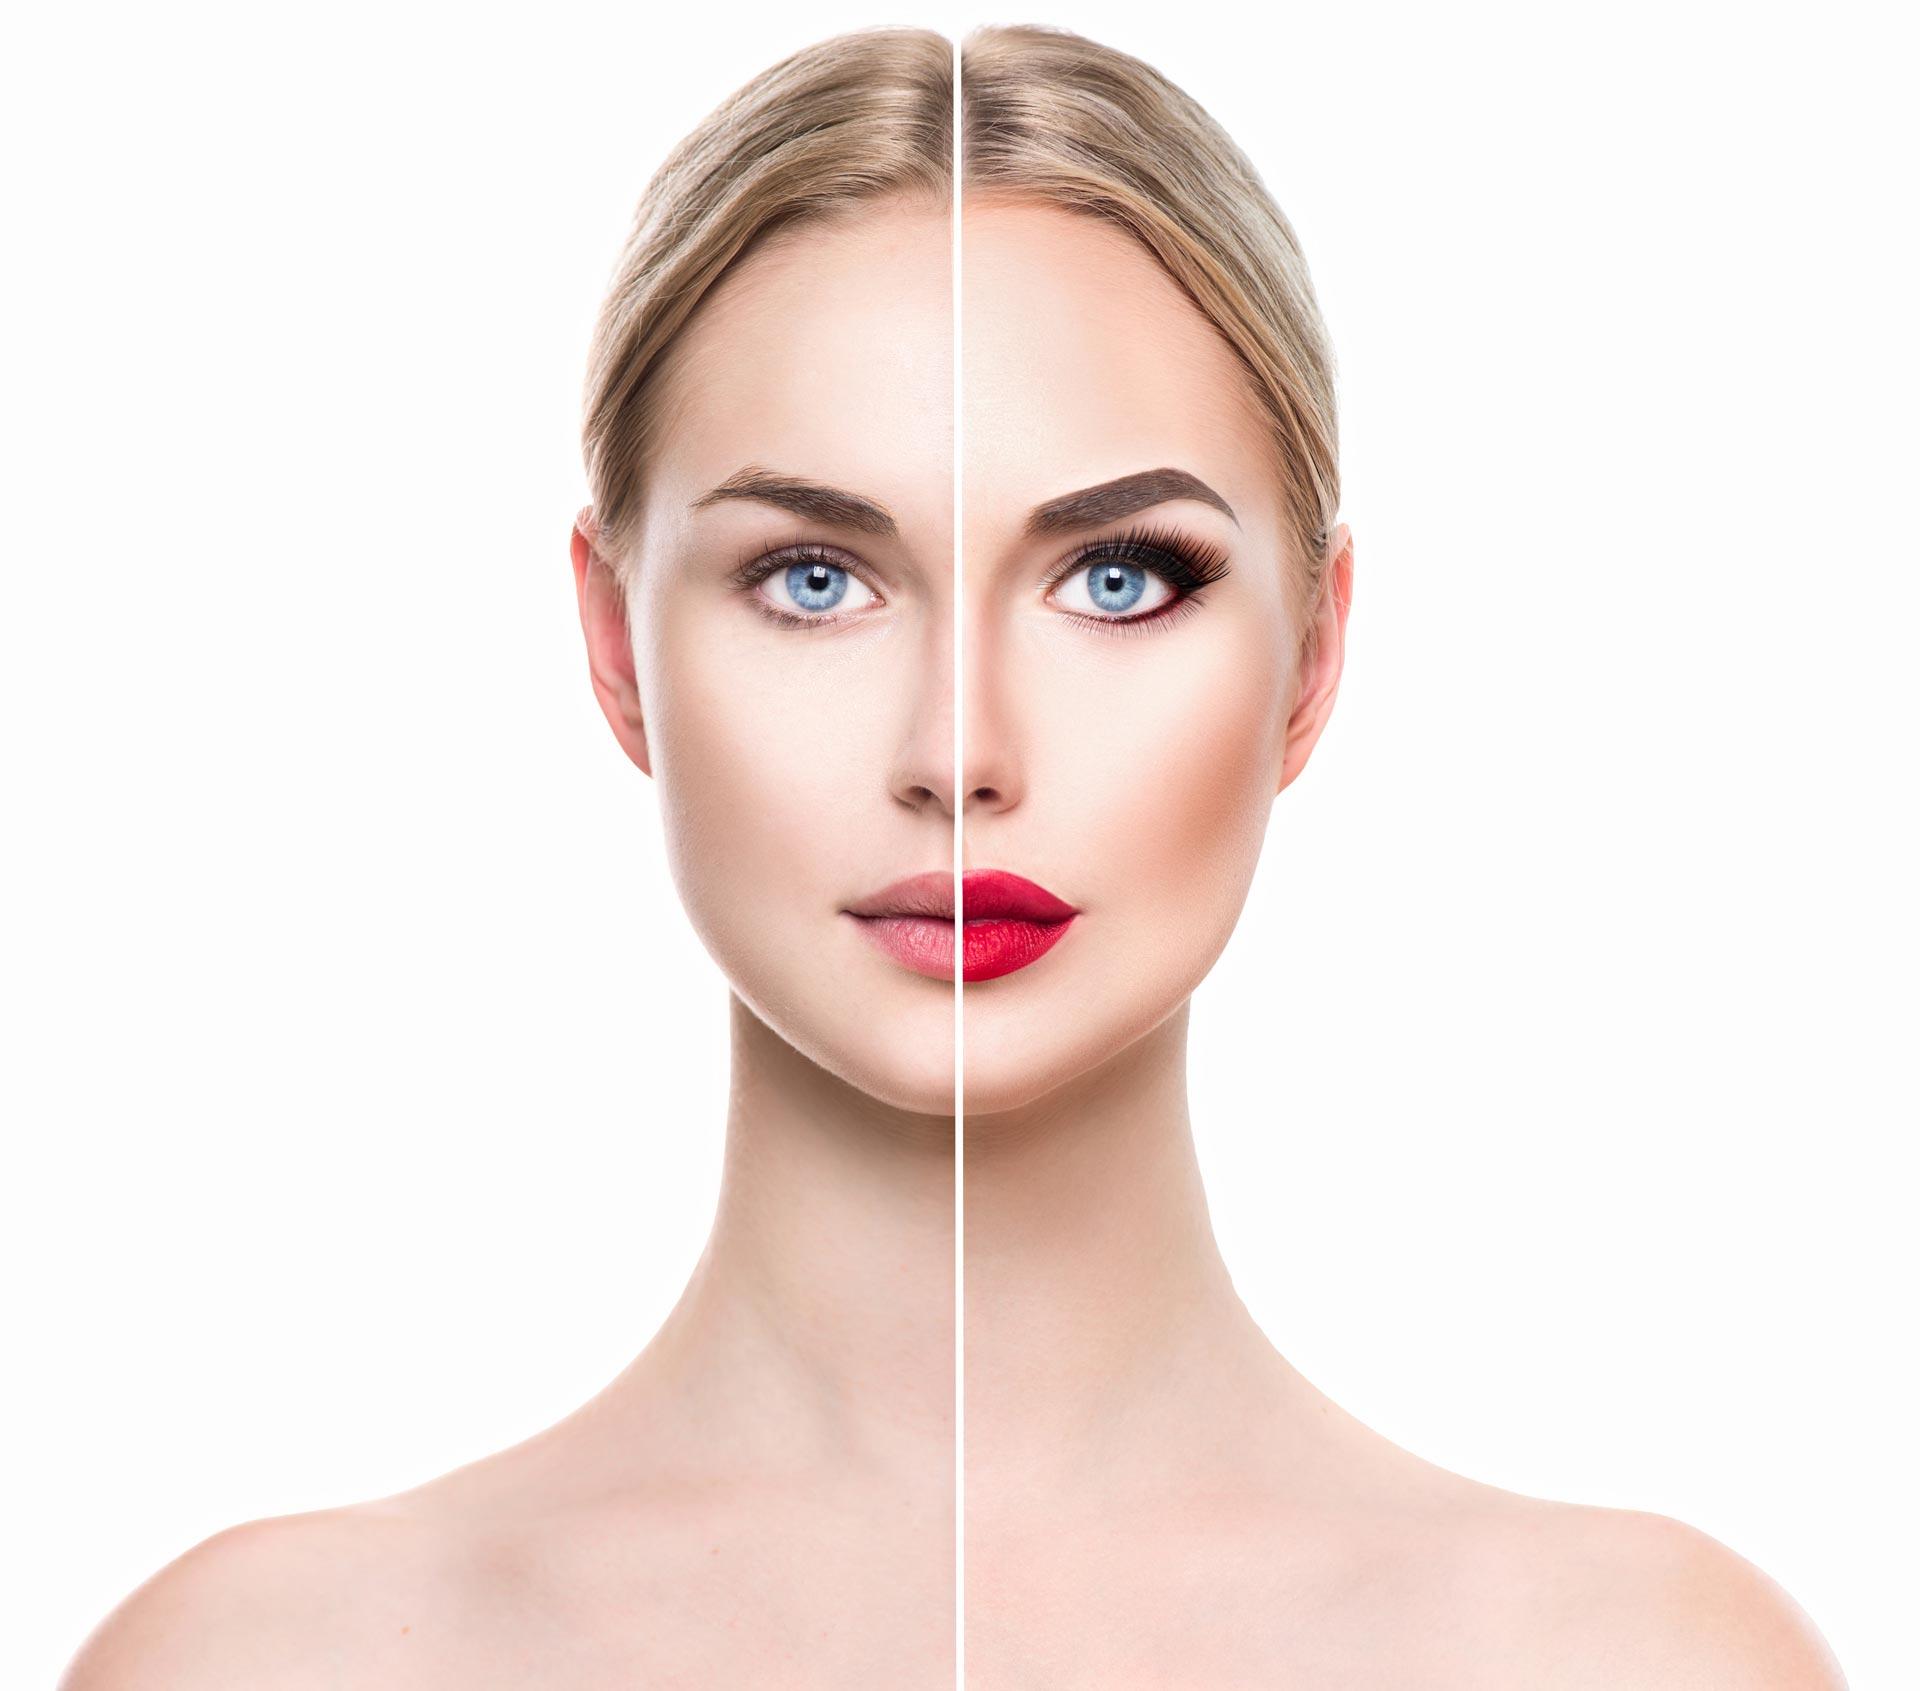 Caka Cosmetics Kosmetikfachschule Mannheim Schulungen Permanent Make-Up Microblading Wimpernlifting Gesichtsbehandlung Hero